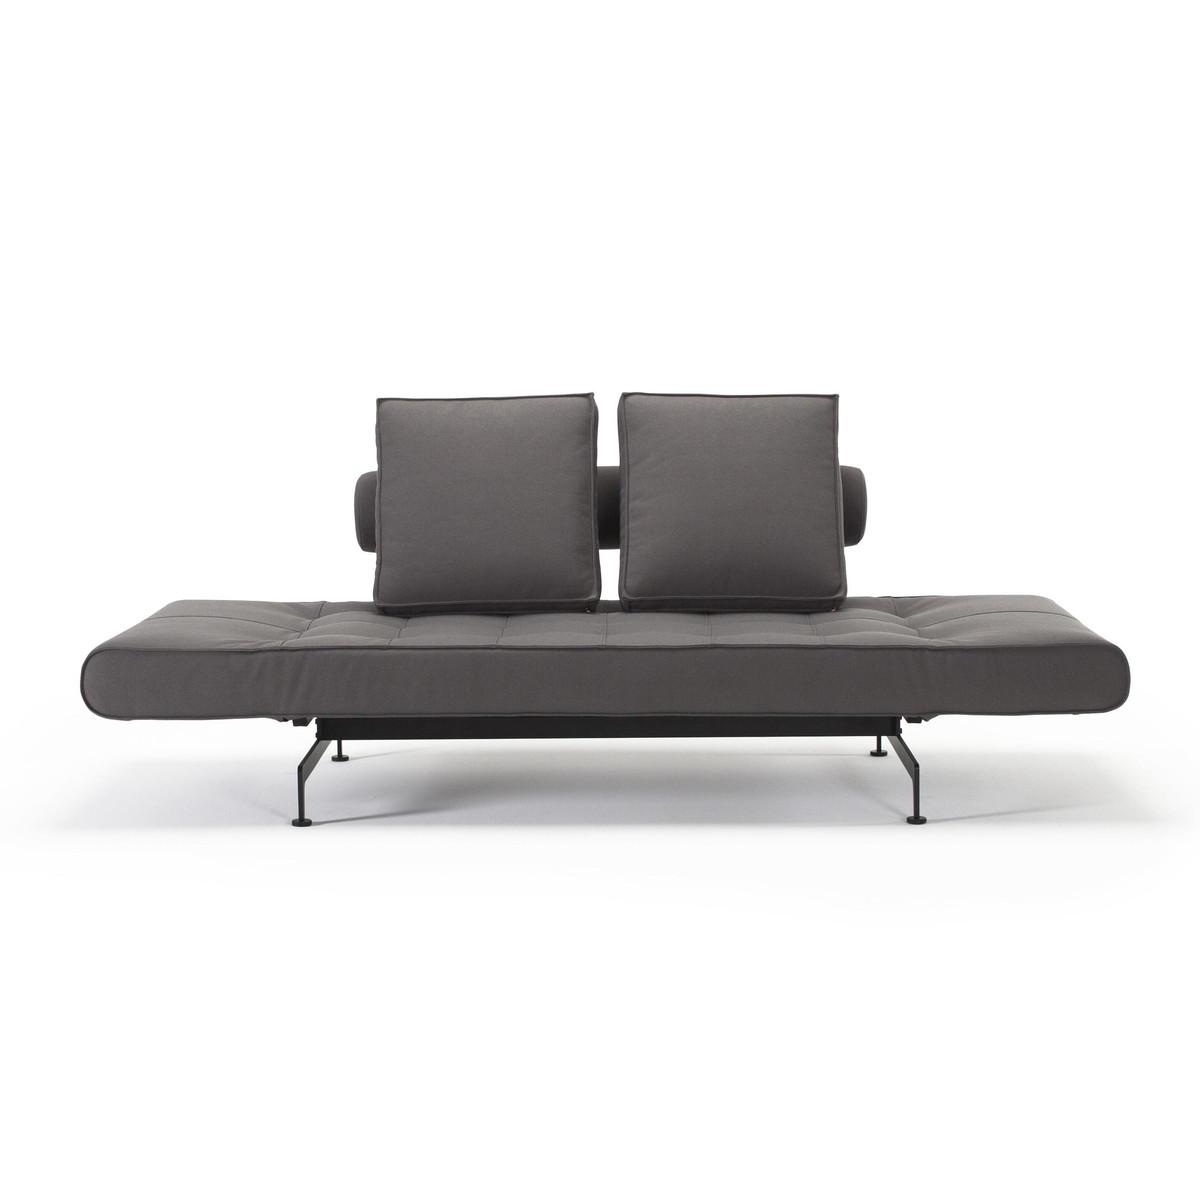 grau sofa trendy full size of ideenkhles ikea ektorp grau. Black Bedroom Furniture Sets. Home Design Ideas